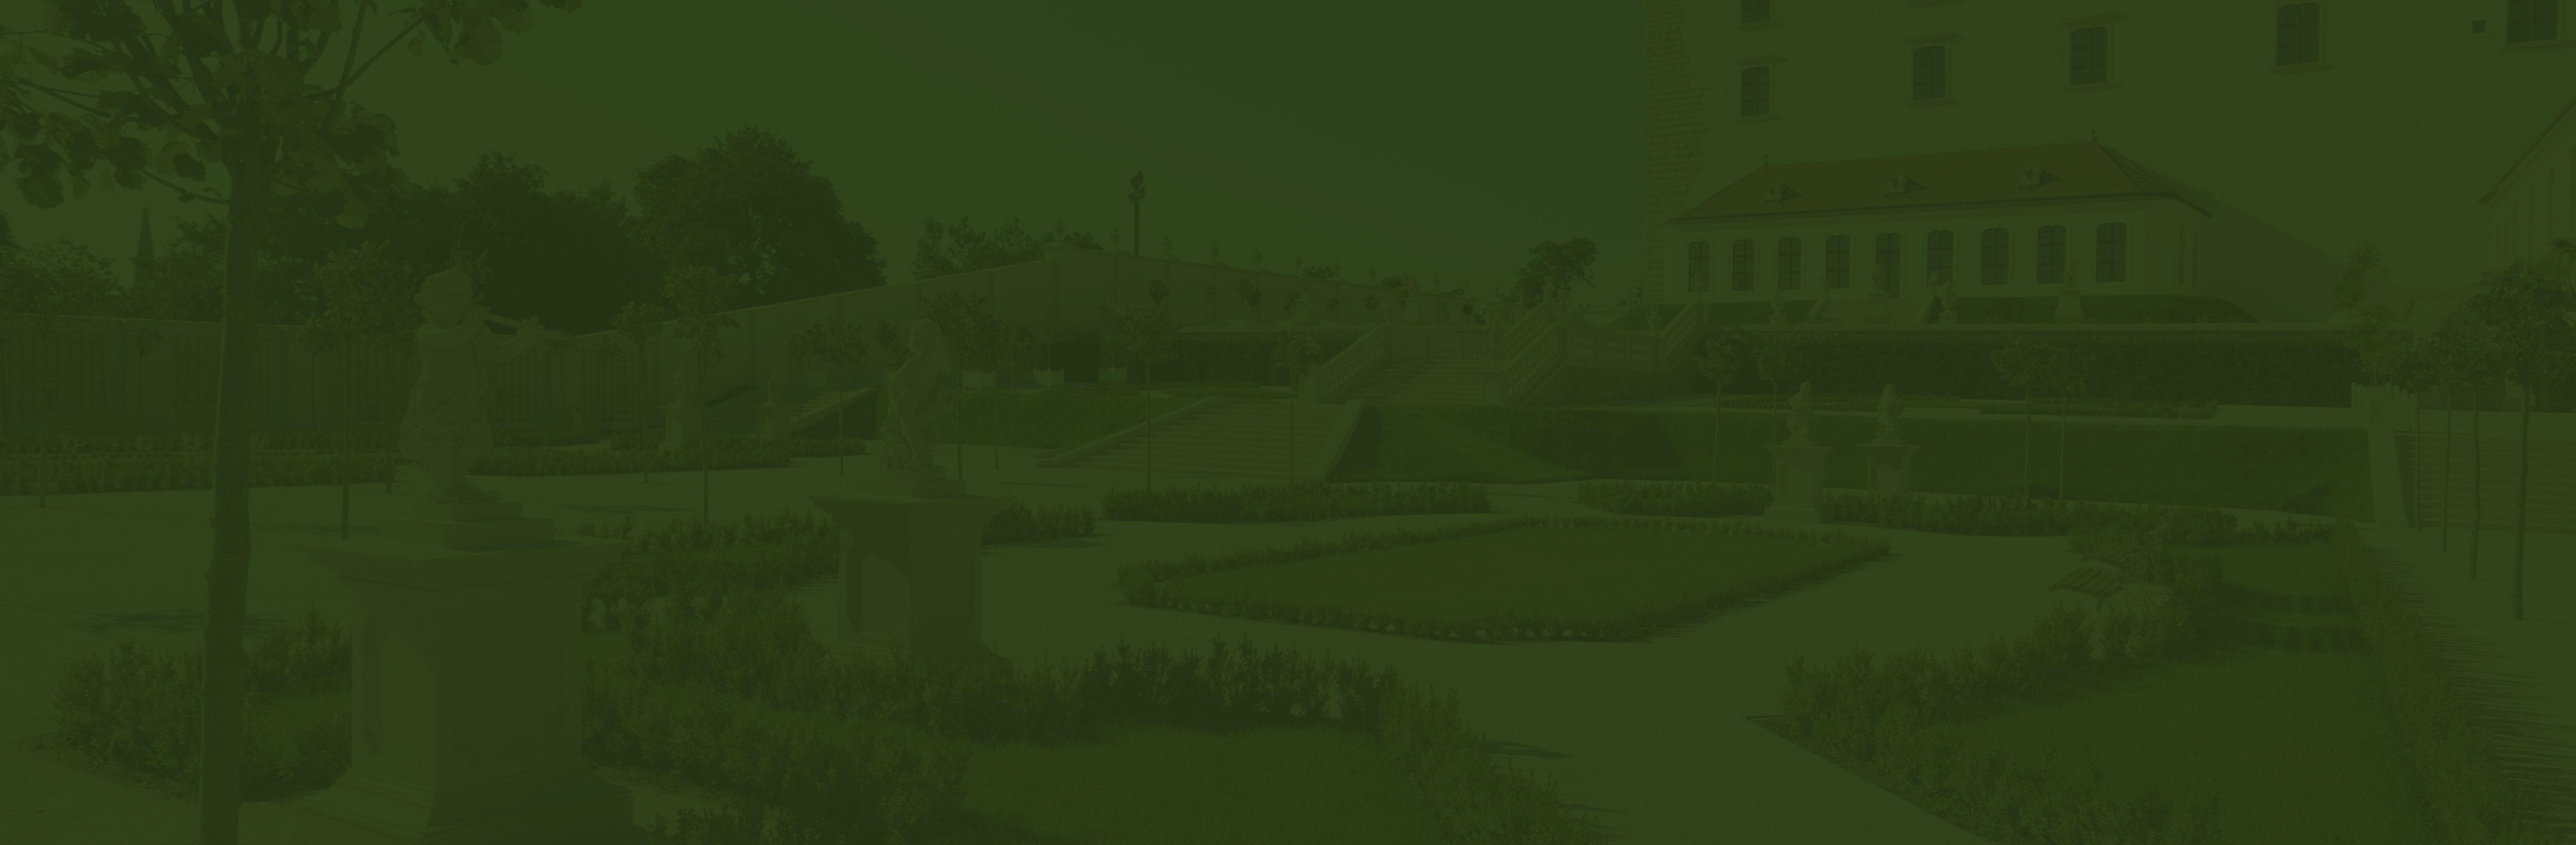 Gallery: Vegetation Blankets